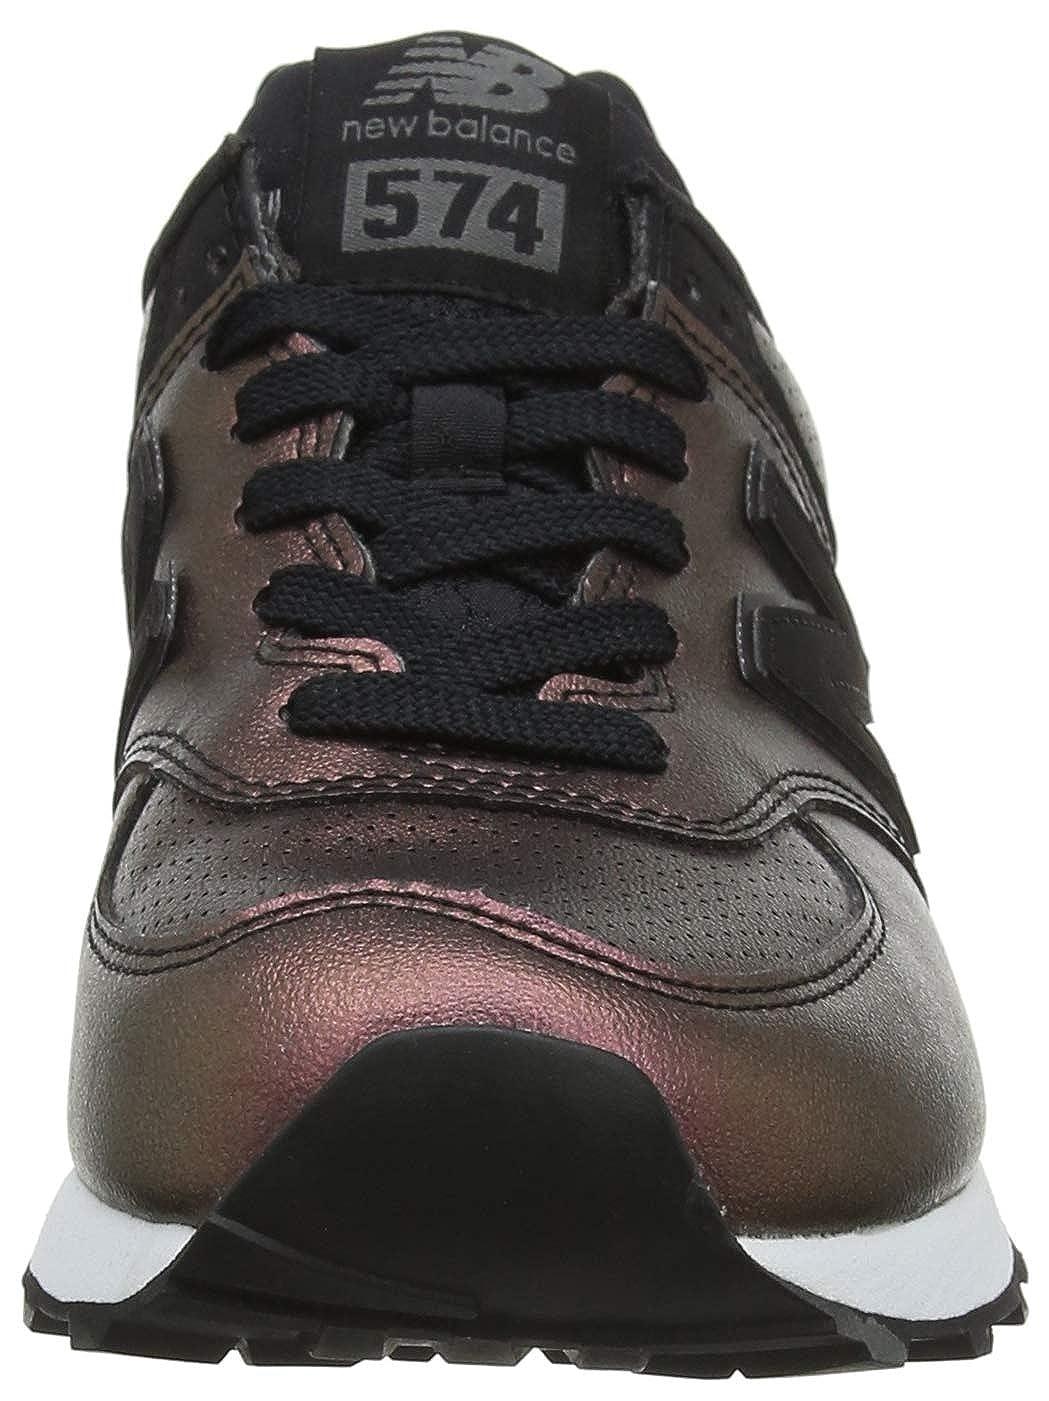 New Balance 574v2 574v2 574v2 Scarpa da Tennis Donna | Valore Formidabile  55bdf0